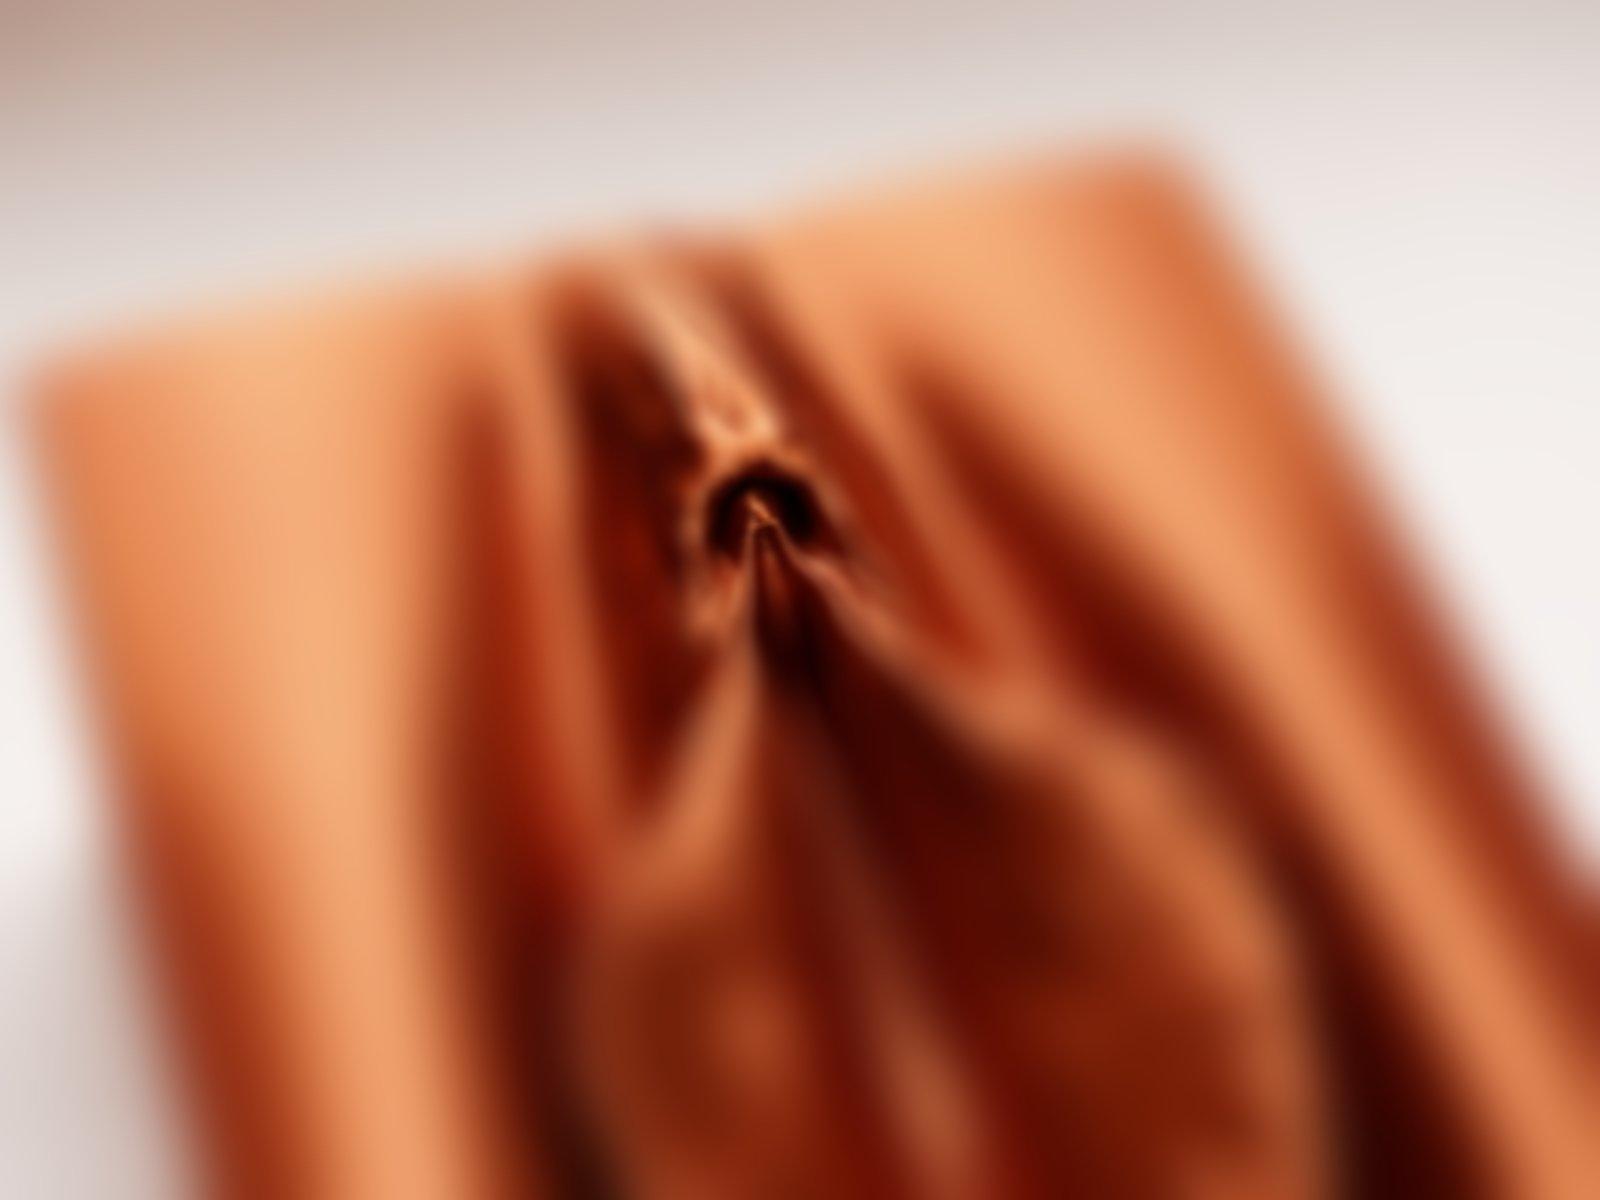 Vulva (NSFW)